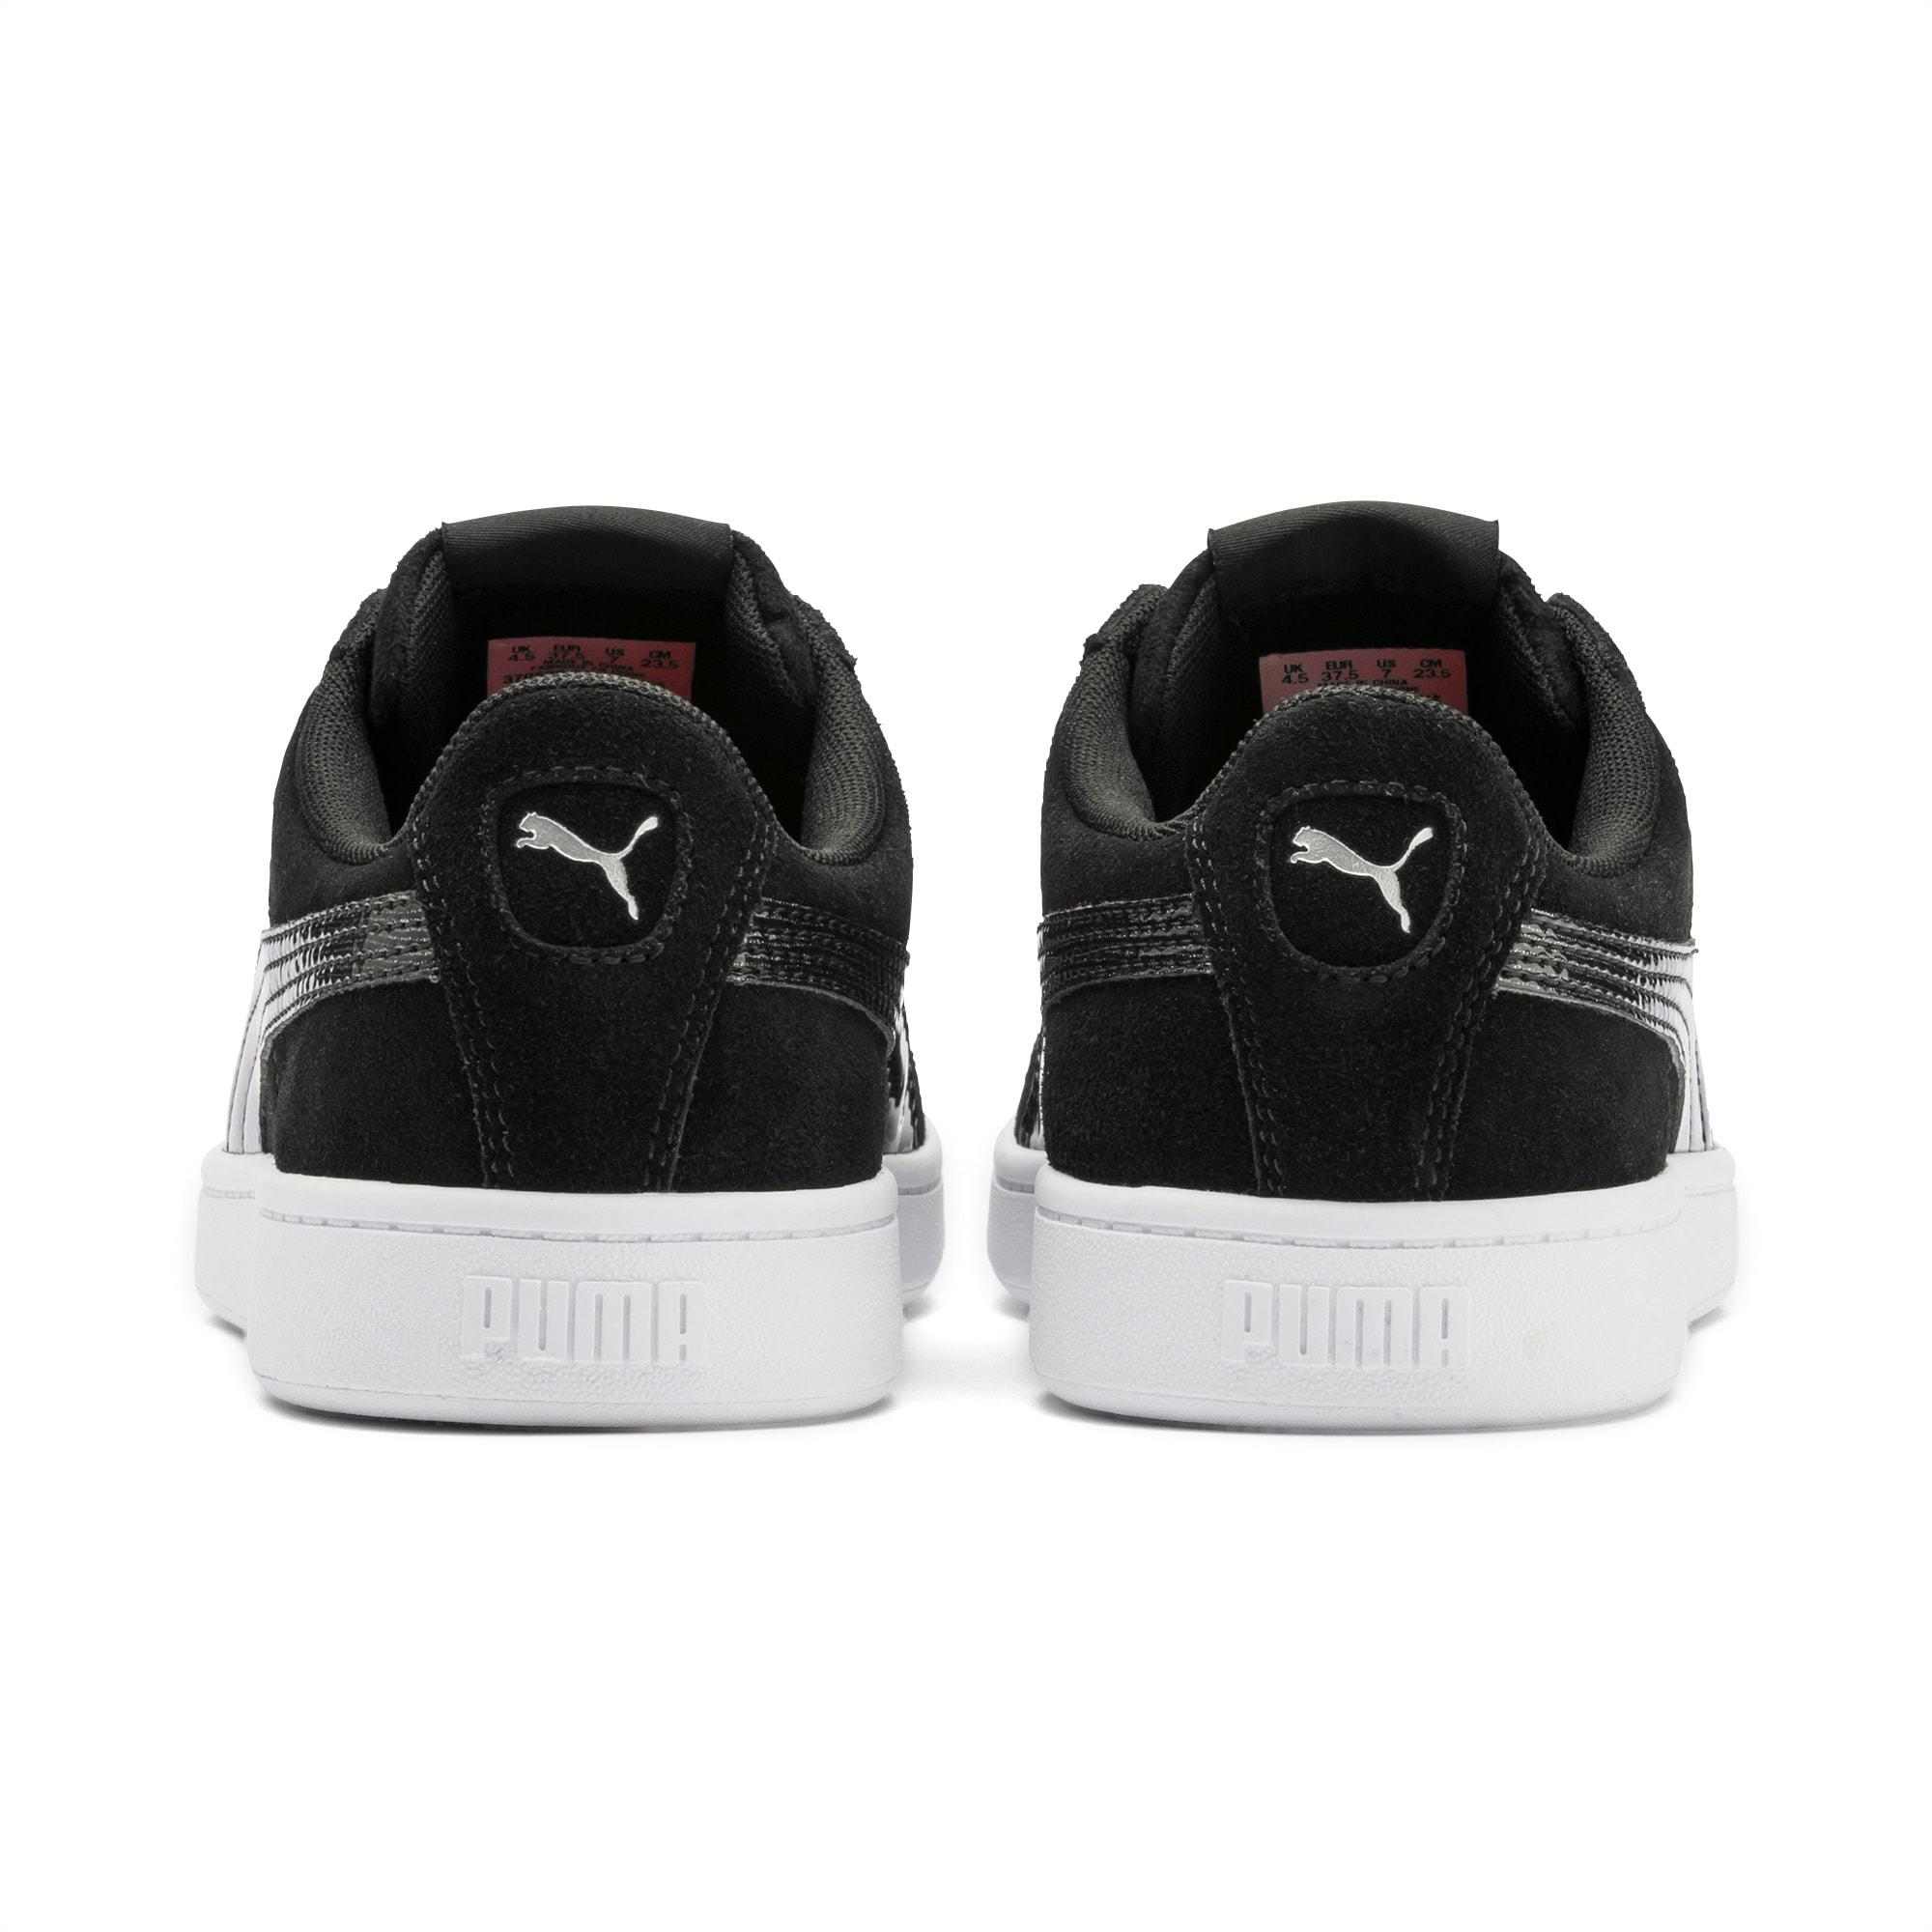 PUMA PUMA Vikky v2 Shift Women's Sneakers Women Shoe Basics